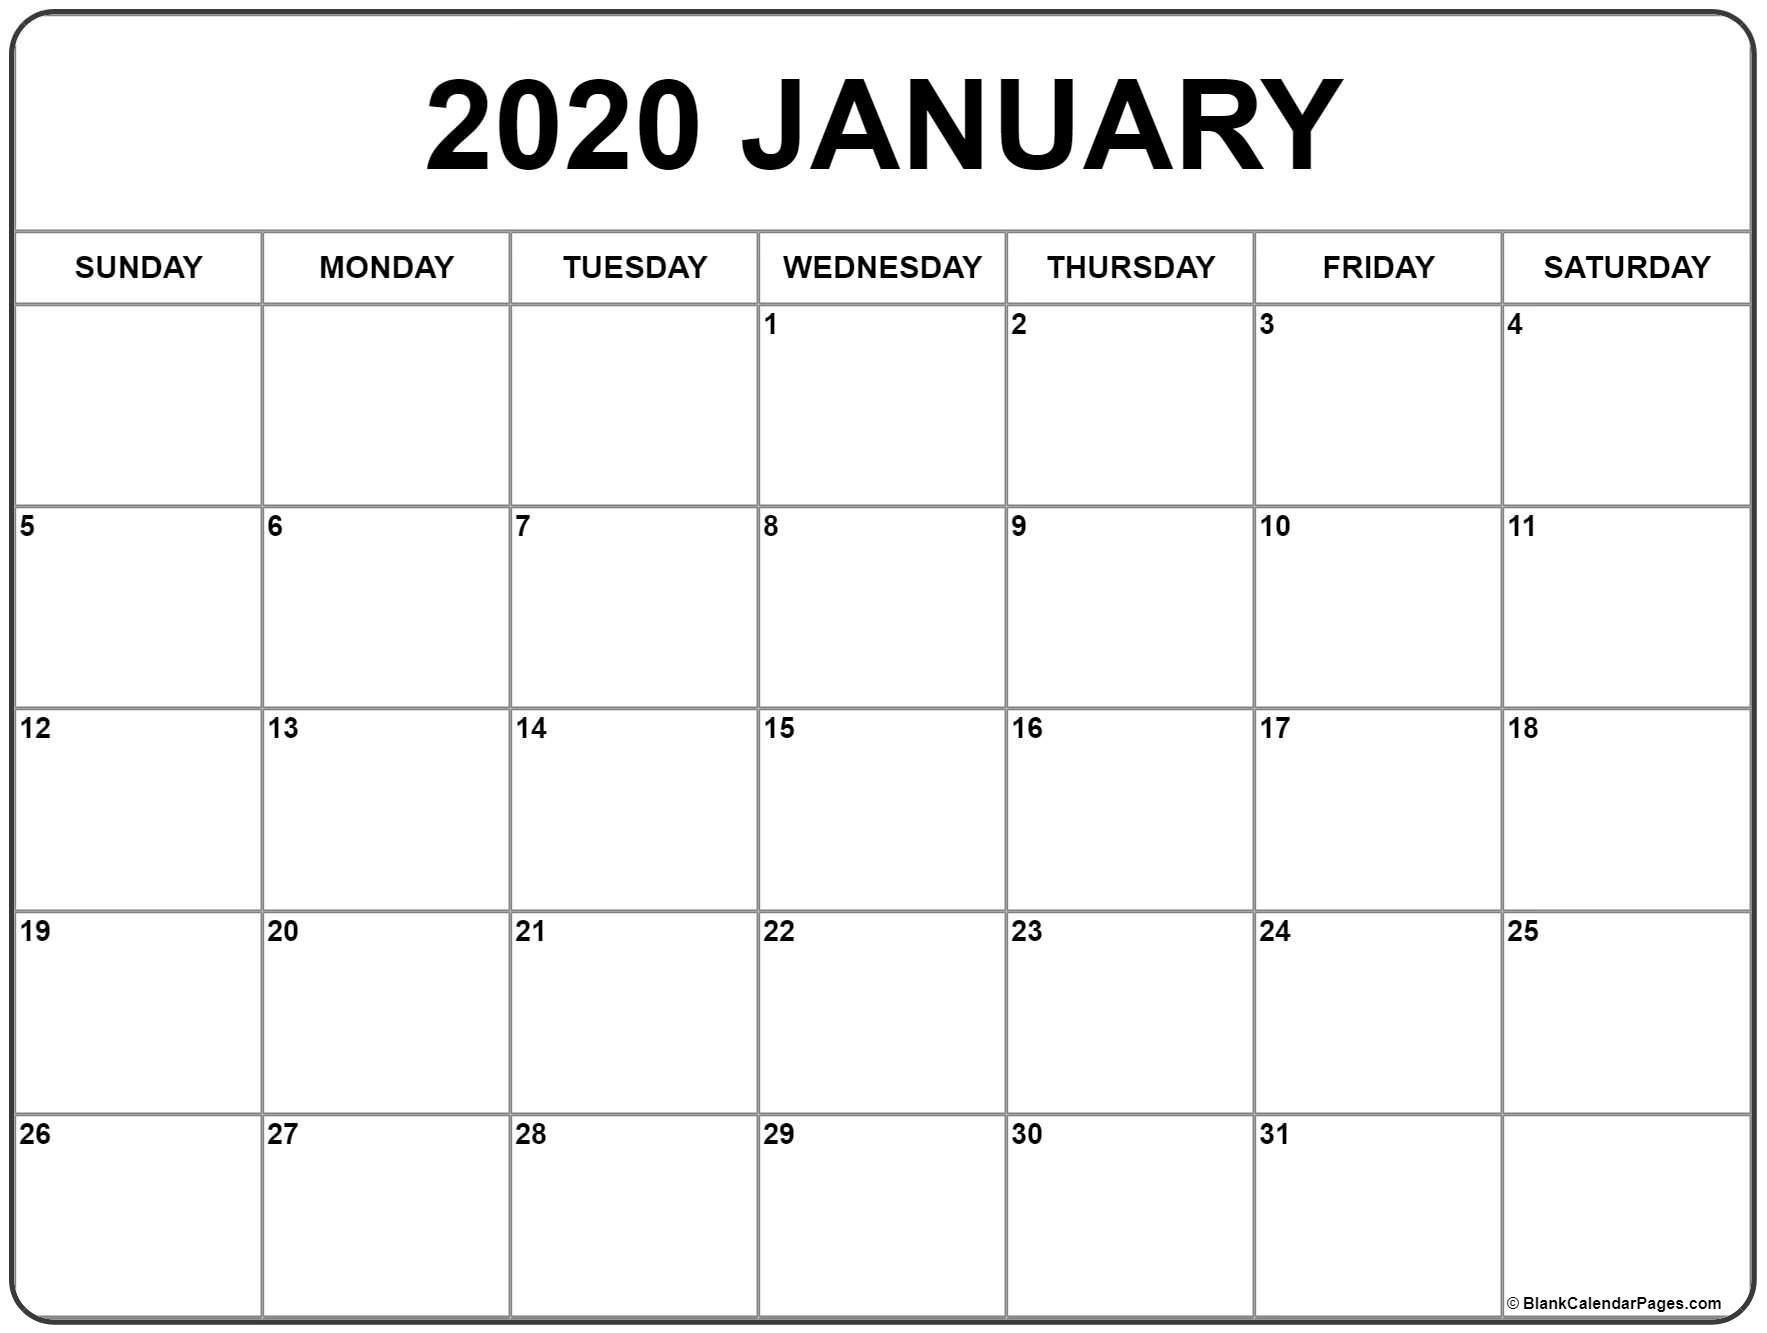 January 2020 Calendar | Free Printable Monthly Calendars-Printable Monthly Calendar June July August 2020